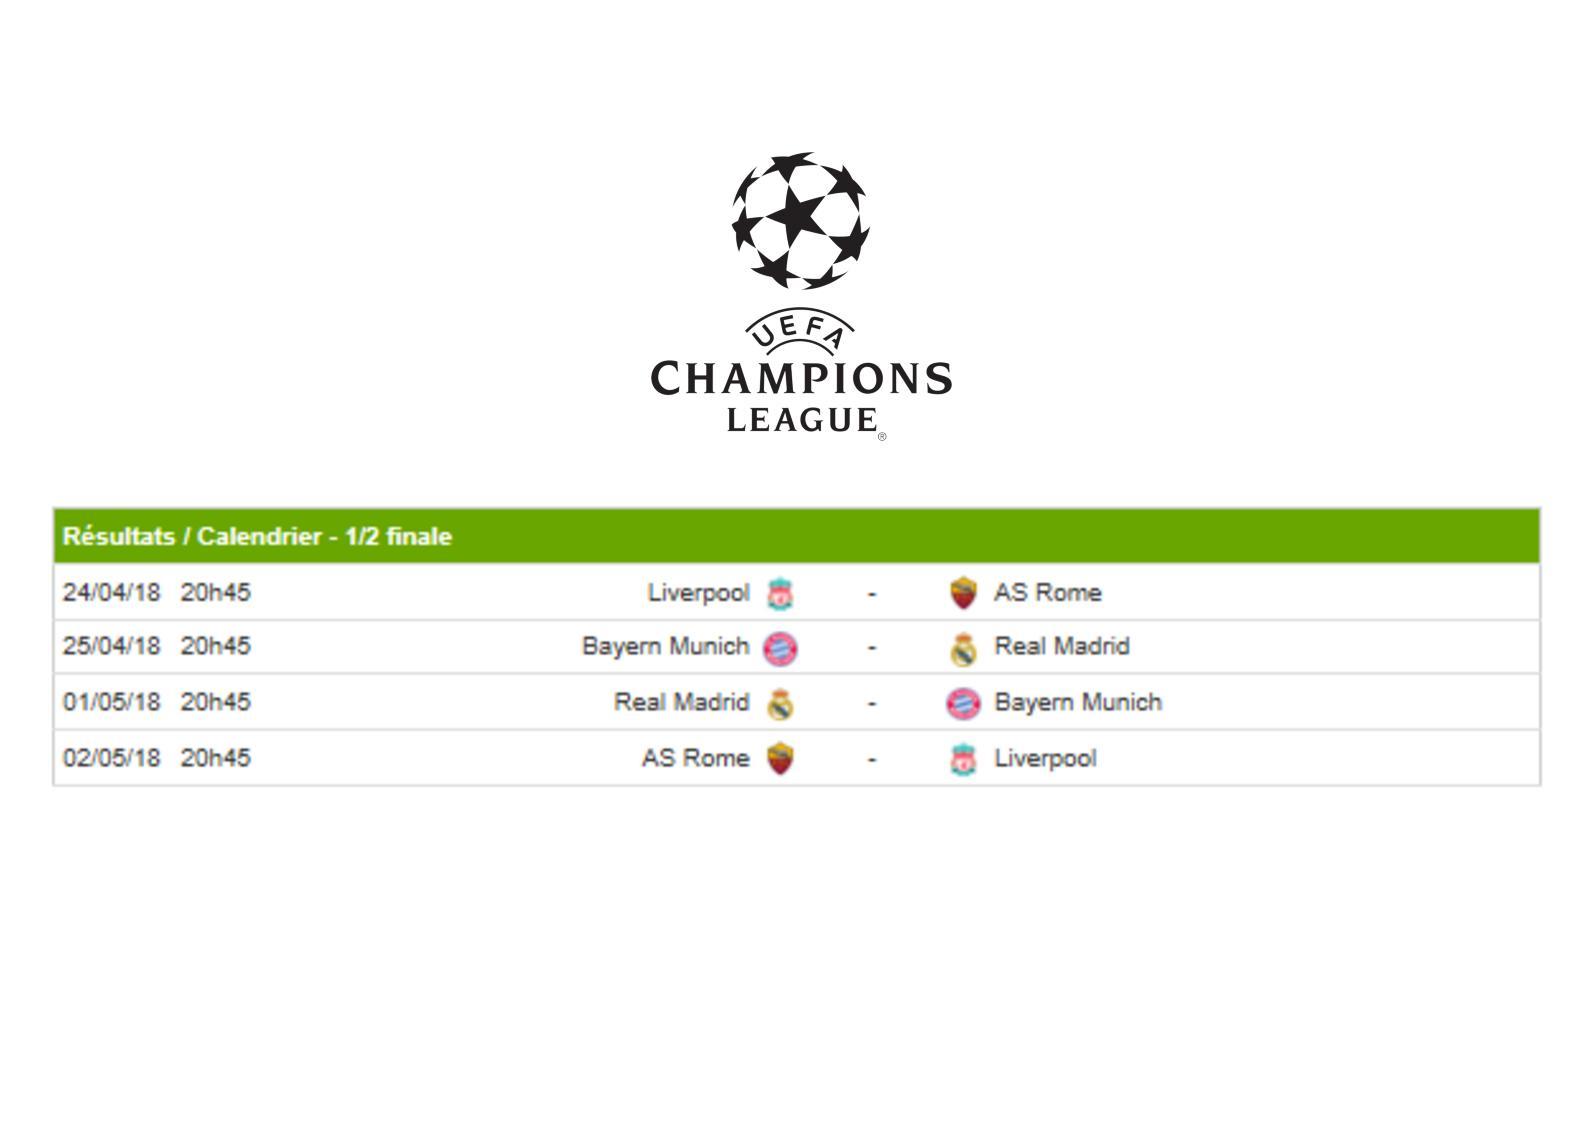 Calendrier Bayern.Calameo Calendrier Champions League